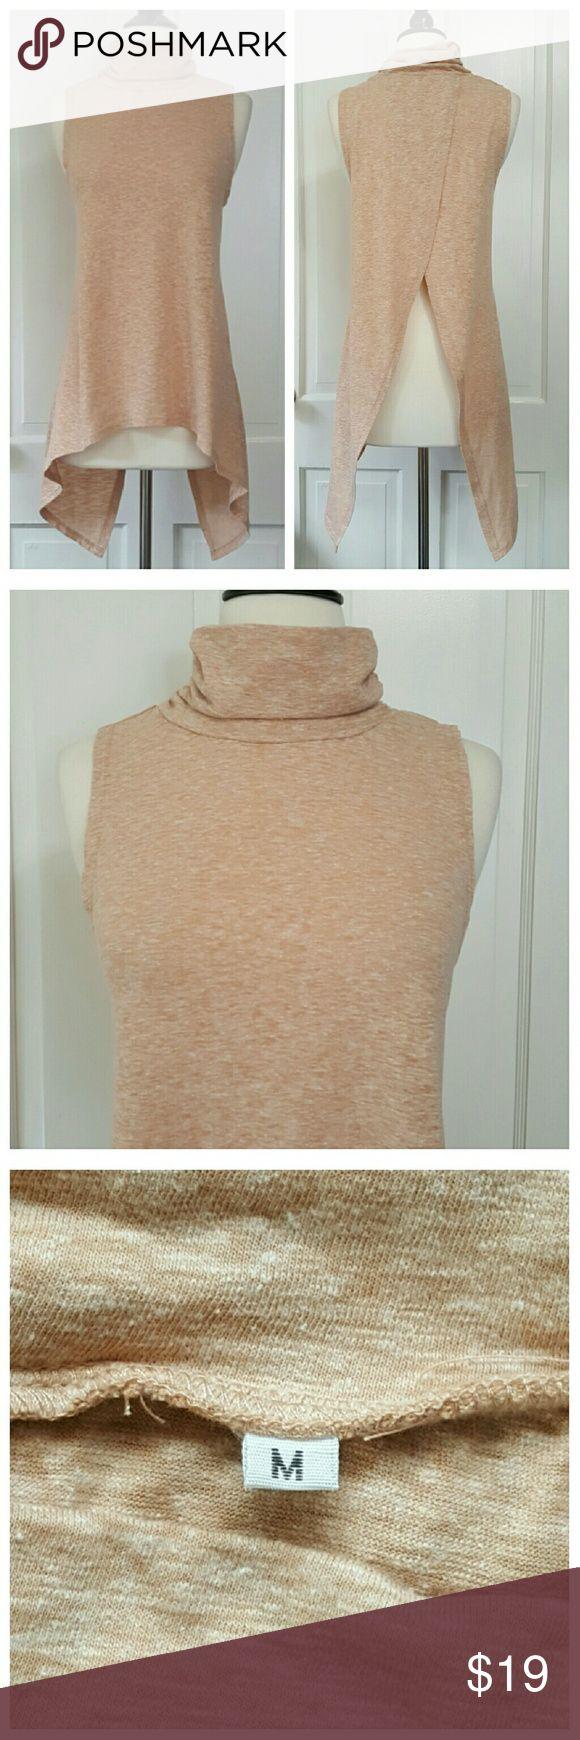 Sleeveless Mock Turtleneck Asymmetrical Top NWOT Sleeveless top with open back and mock turtleneck, peach, NWOT. Tops